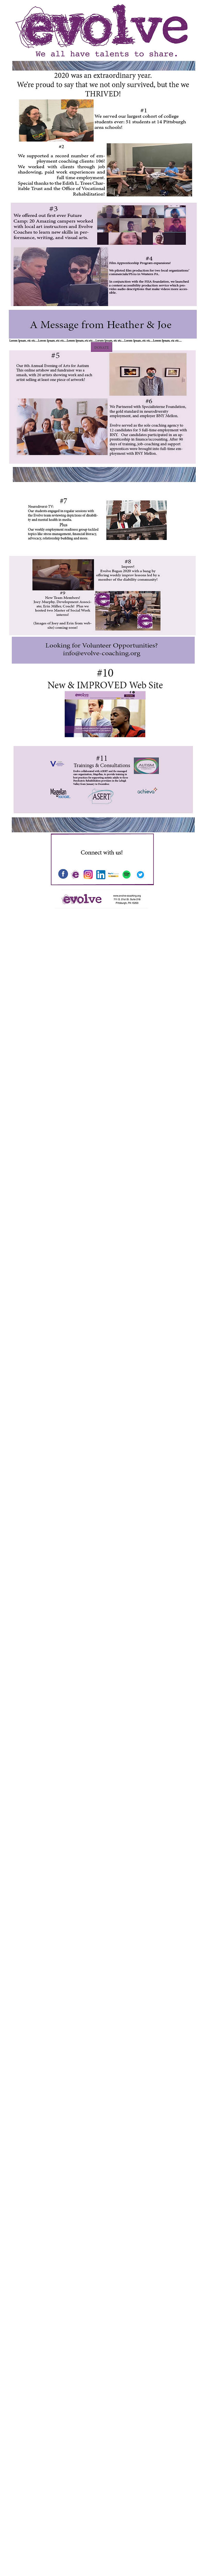 Evolve 11 Layout Budget 2.jpg